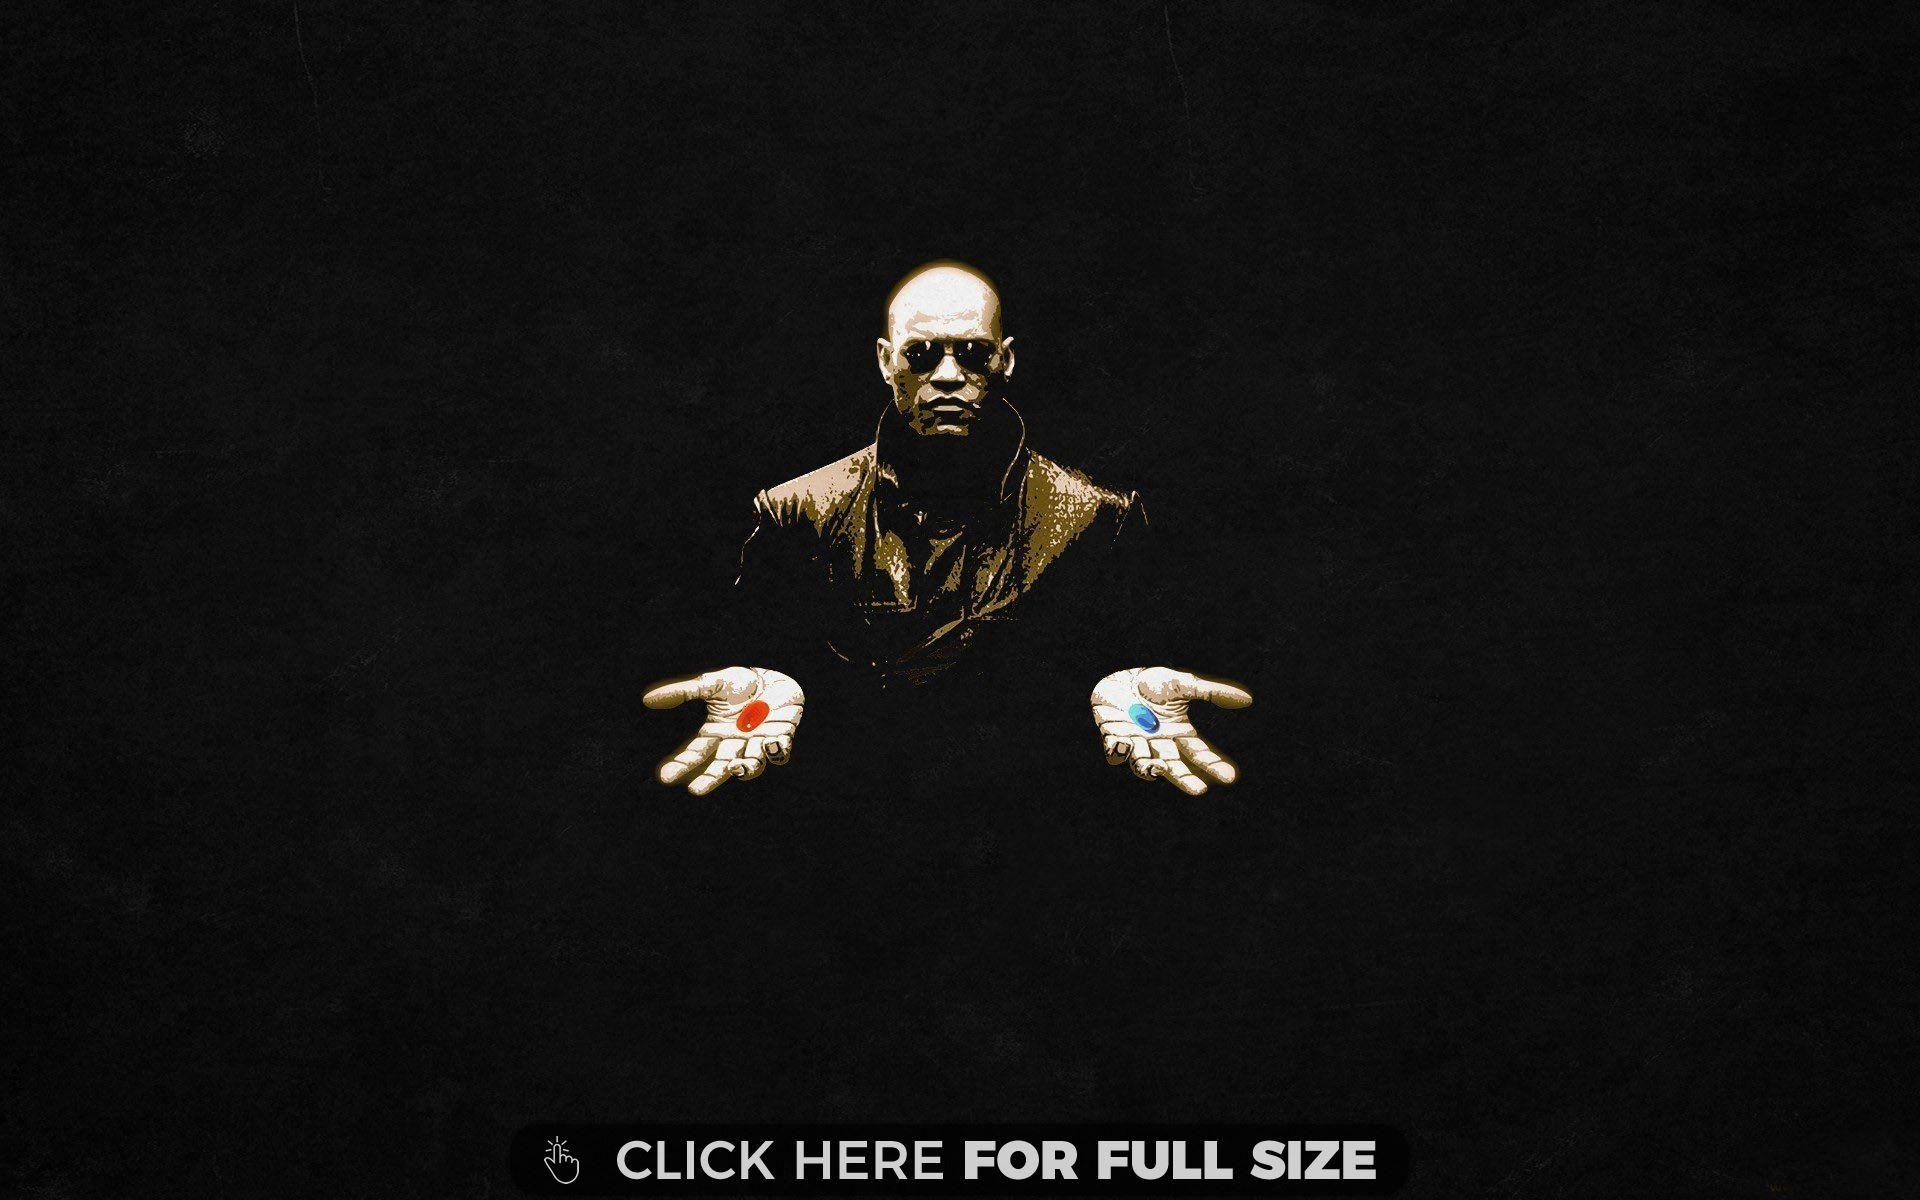 Morpheus Sci Fi Wallpaper Movie Wallpapers Hd Wallpaper